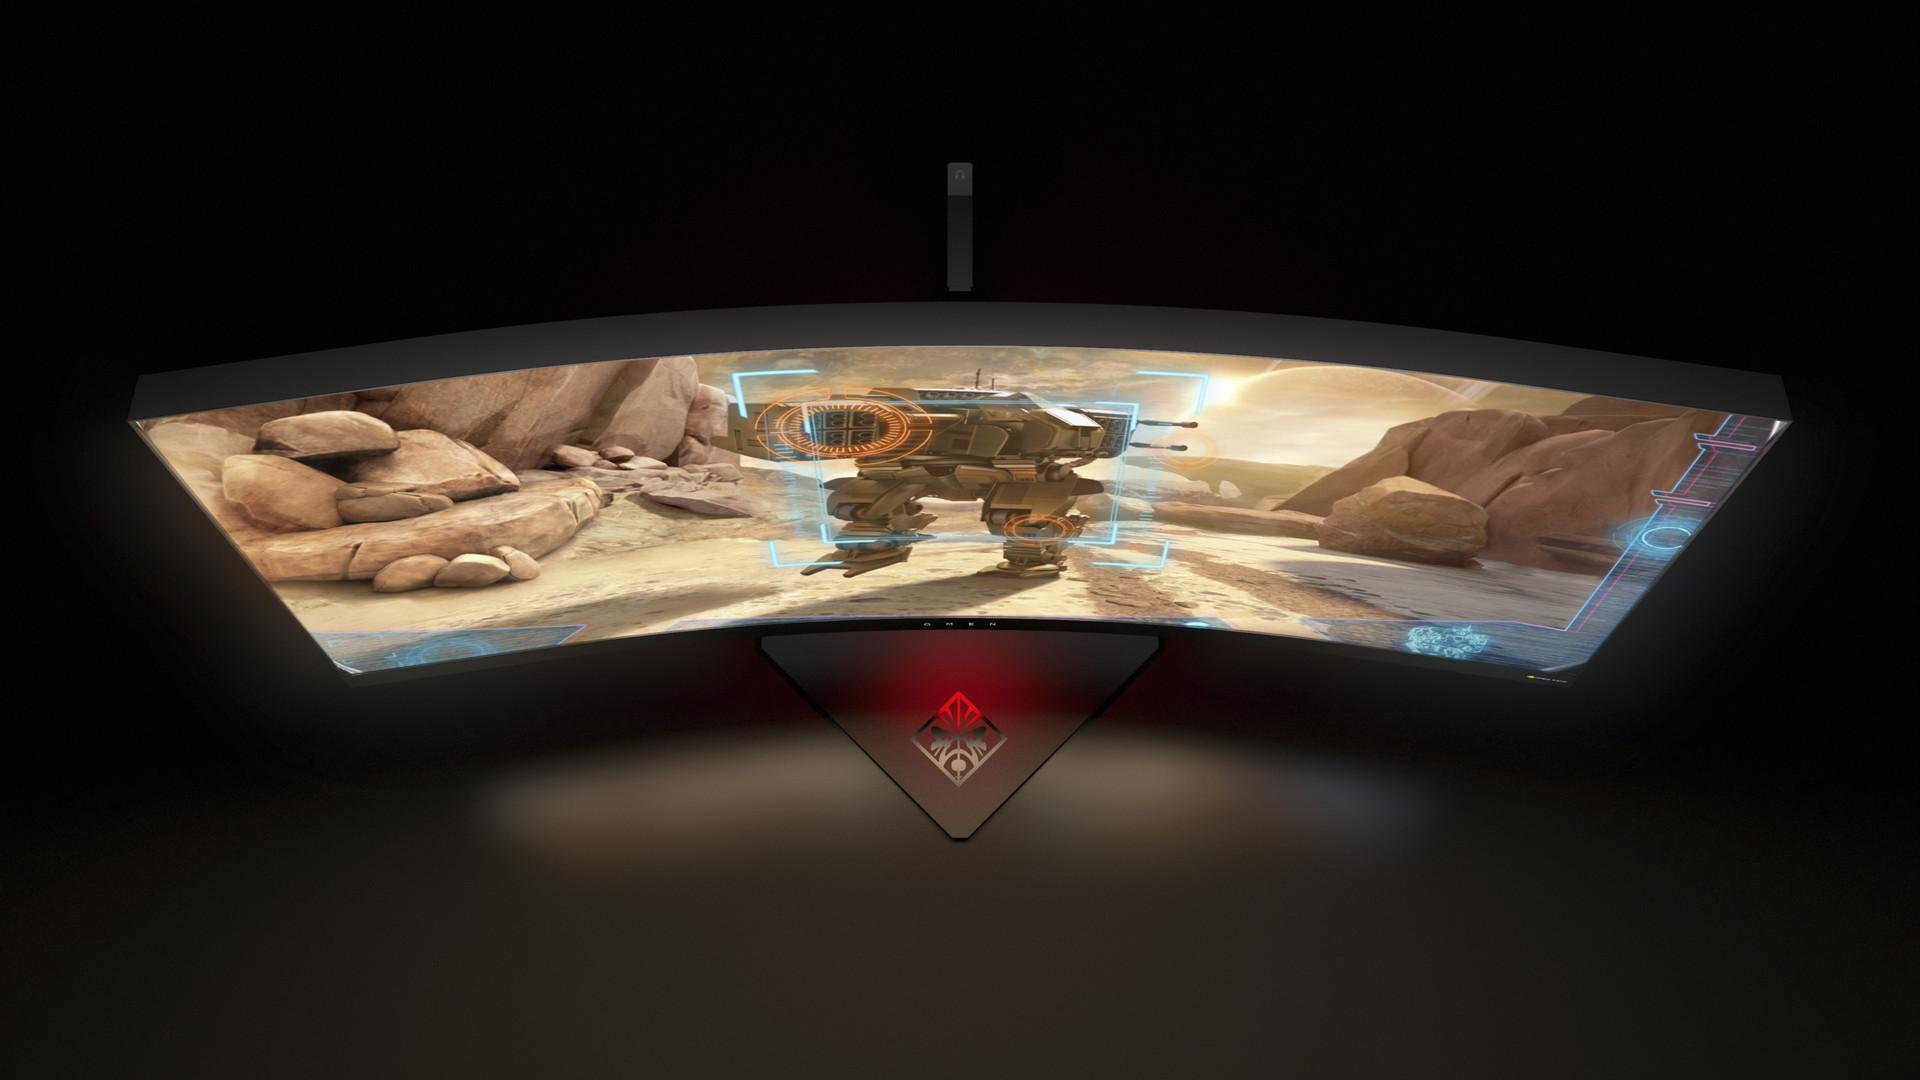 hp-omen-x-35-gaming-monitor-600-02